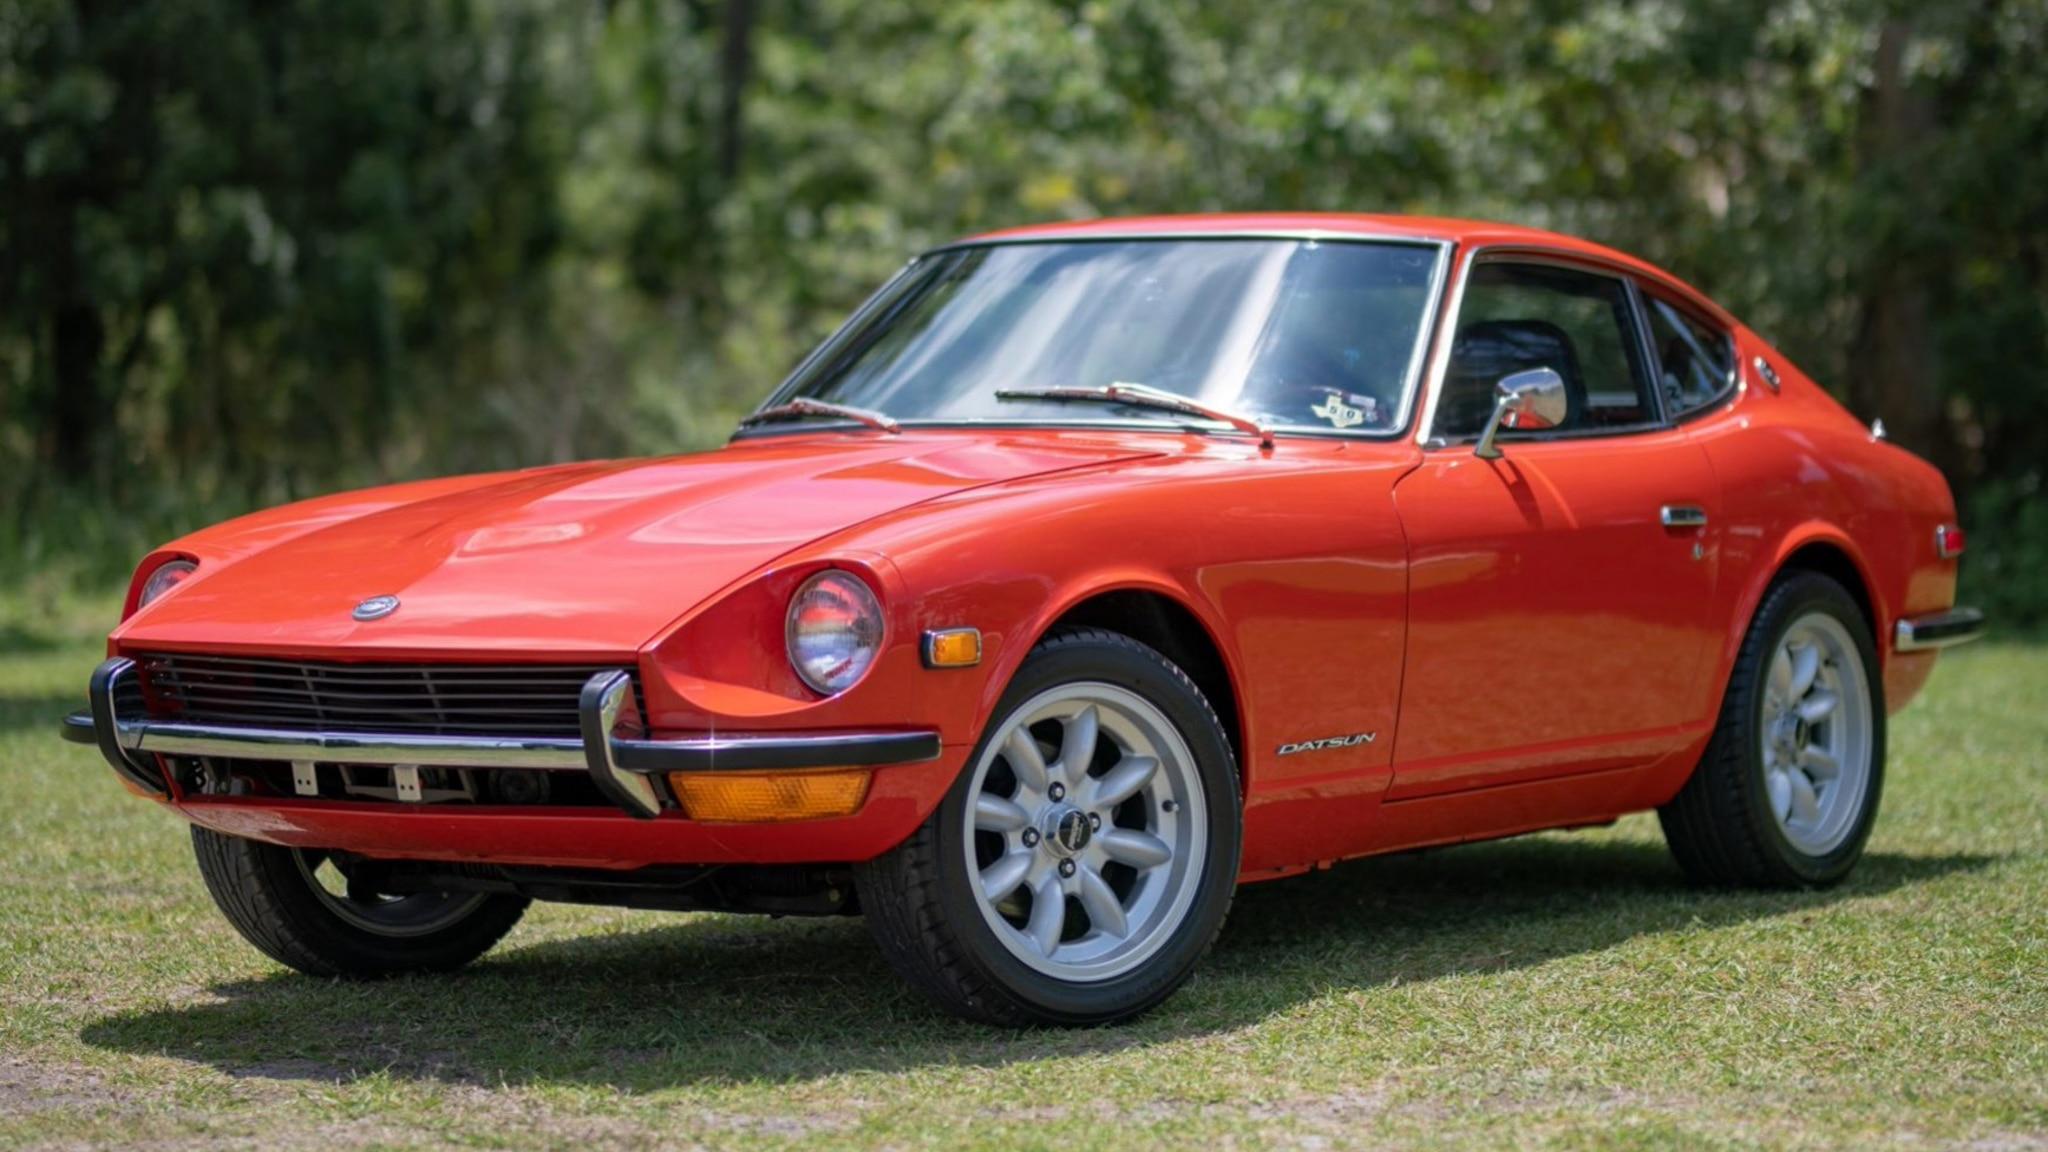 https://www.automobilemag.com/uploads/sites/11/2020/06/1972_datsun_240z_lead-image.jpg